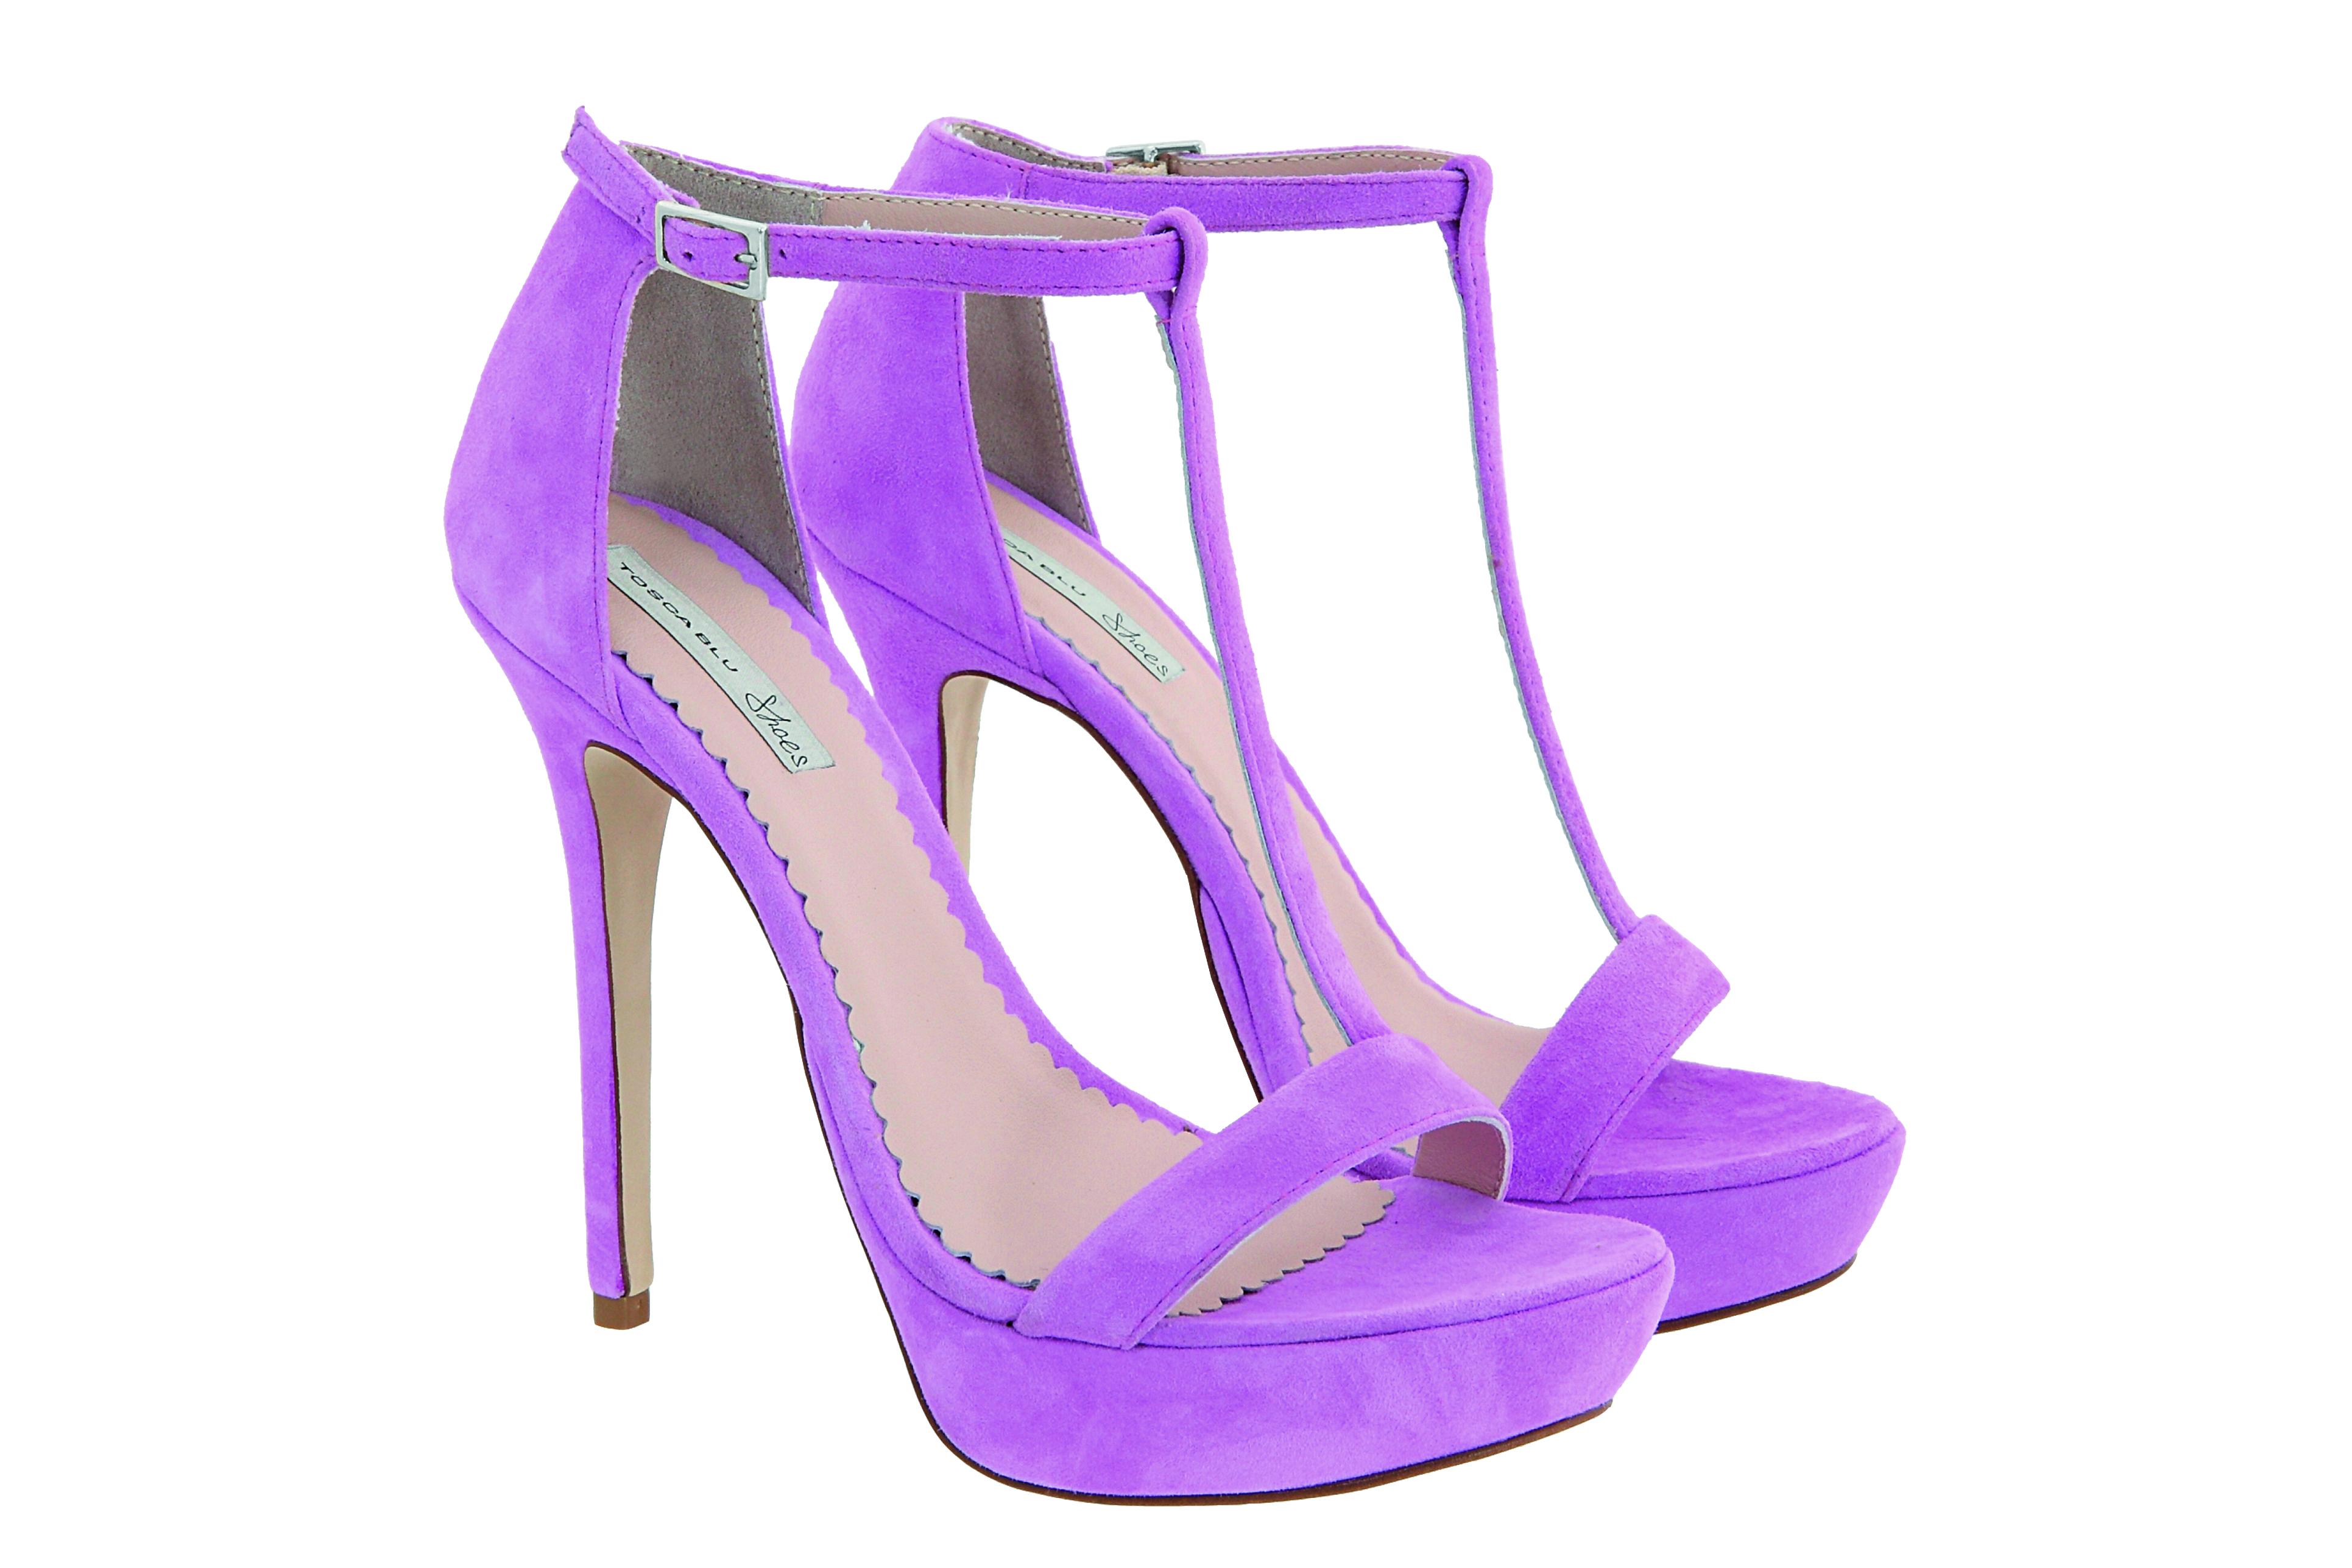 Lilla Tacco Fashion Alto Blog Shoeplay Ss2016 Ei29dh Di Sandali Toscablu doWrBCxe